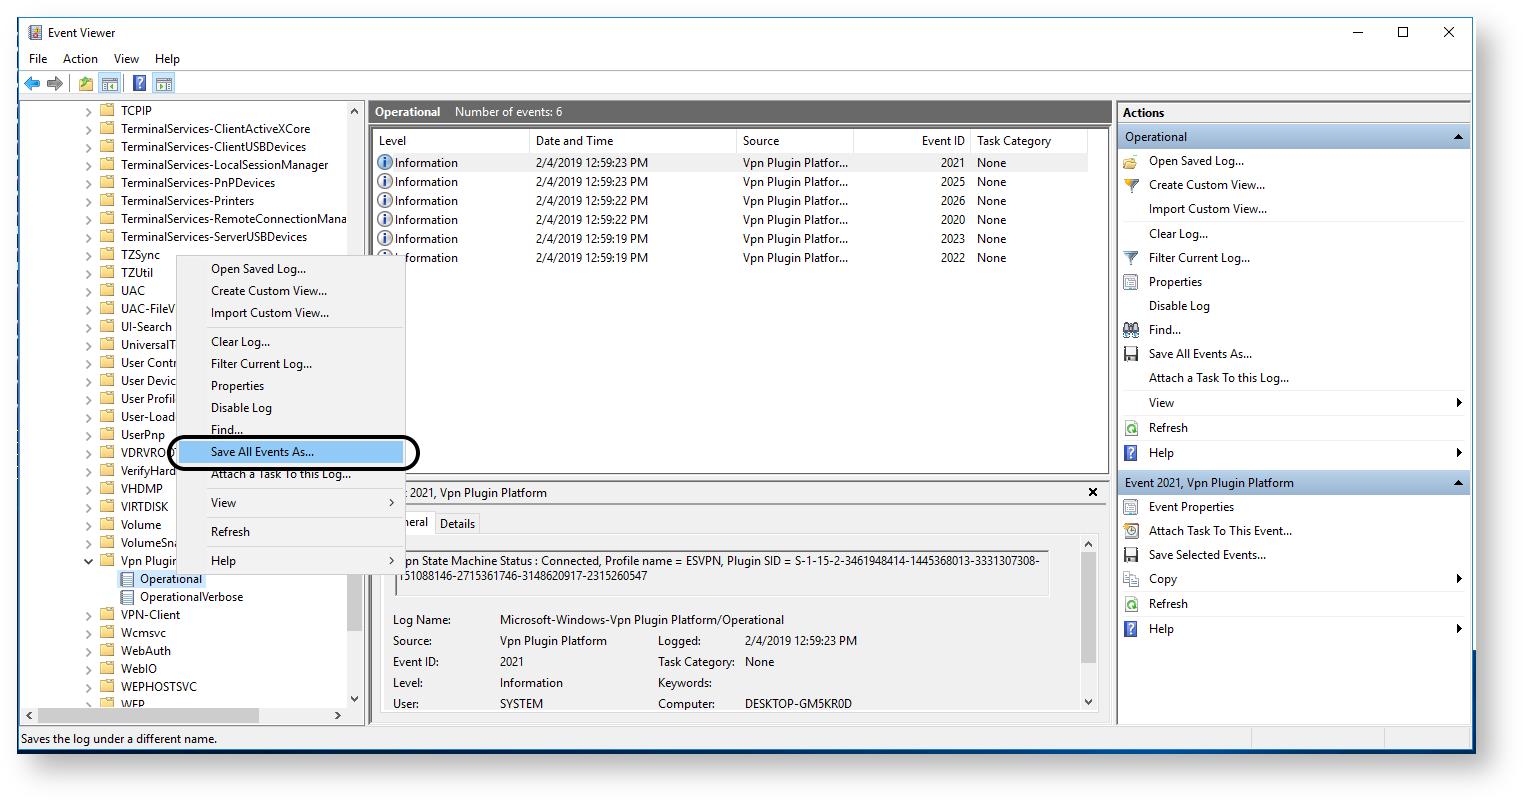 K00819308 - Gathering F5 VPN Client Logs